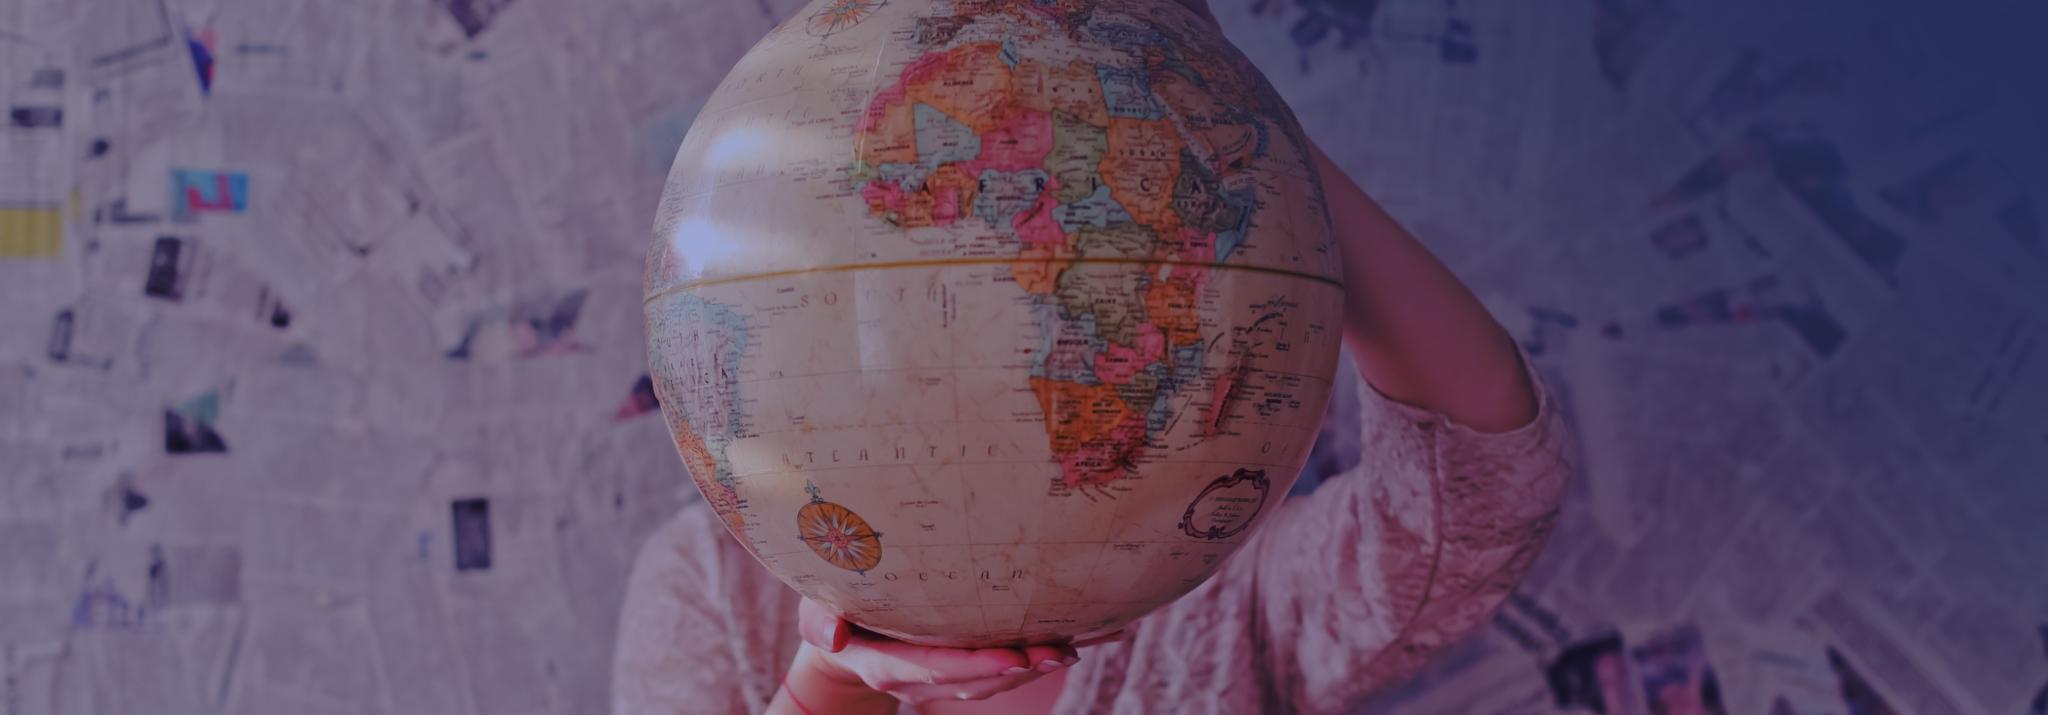 Worldview-globe-Unsplash-2